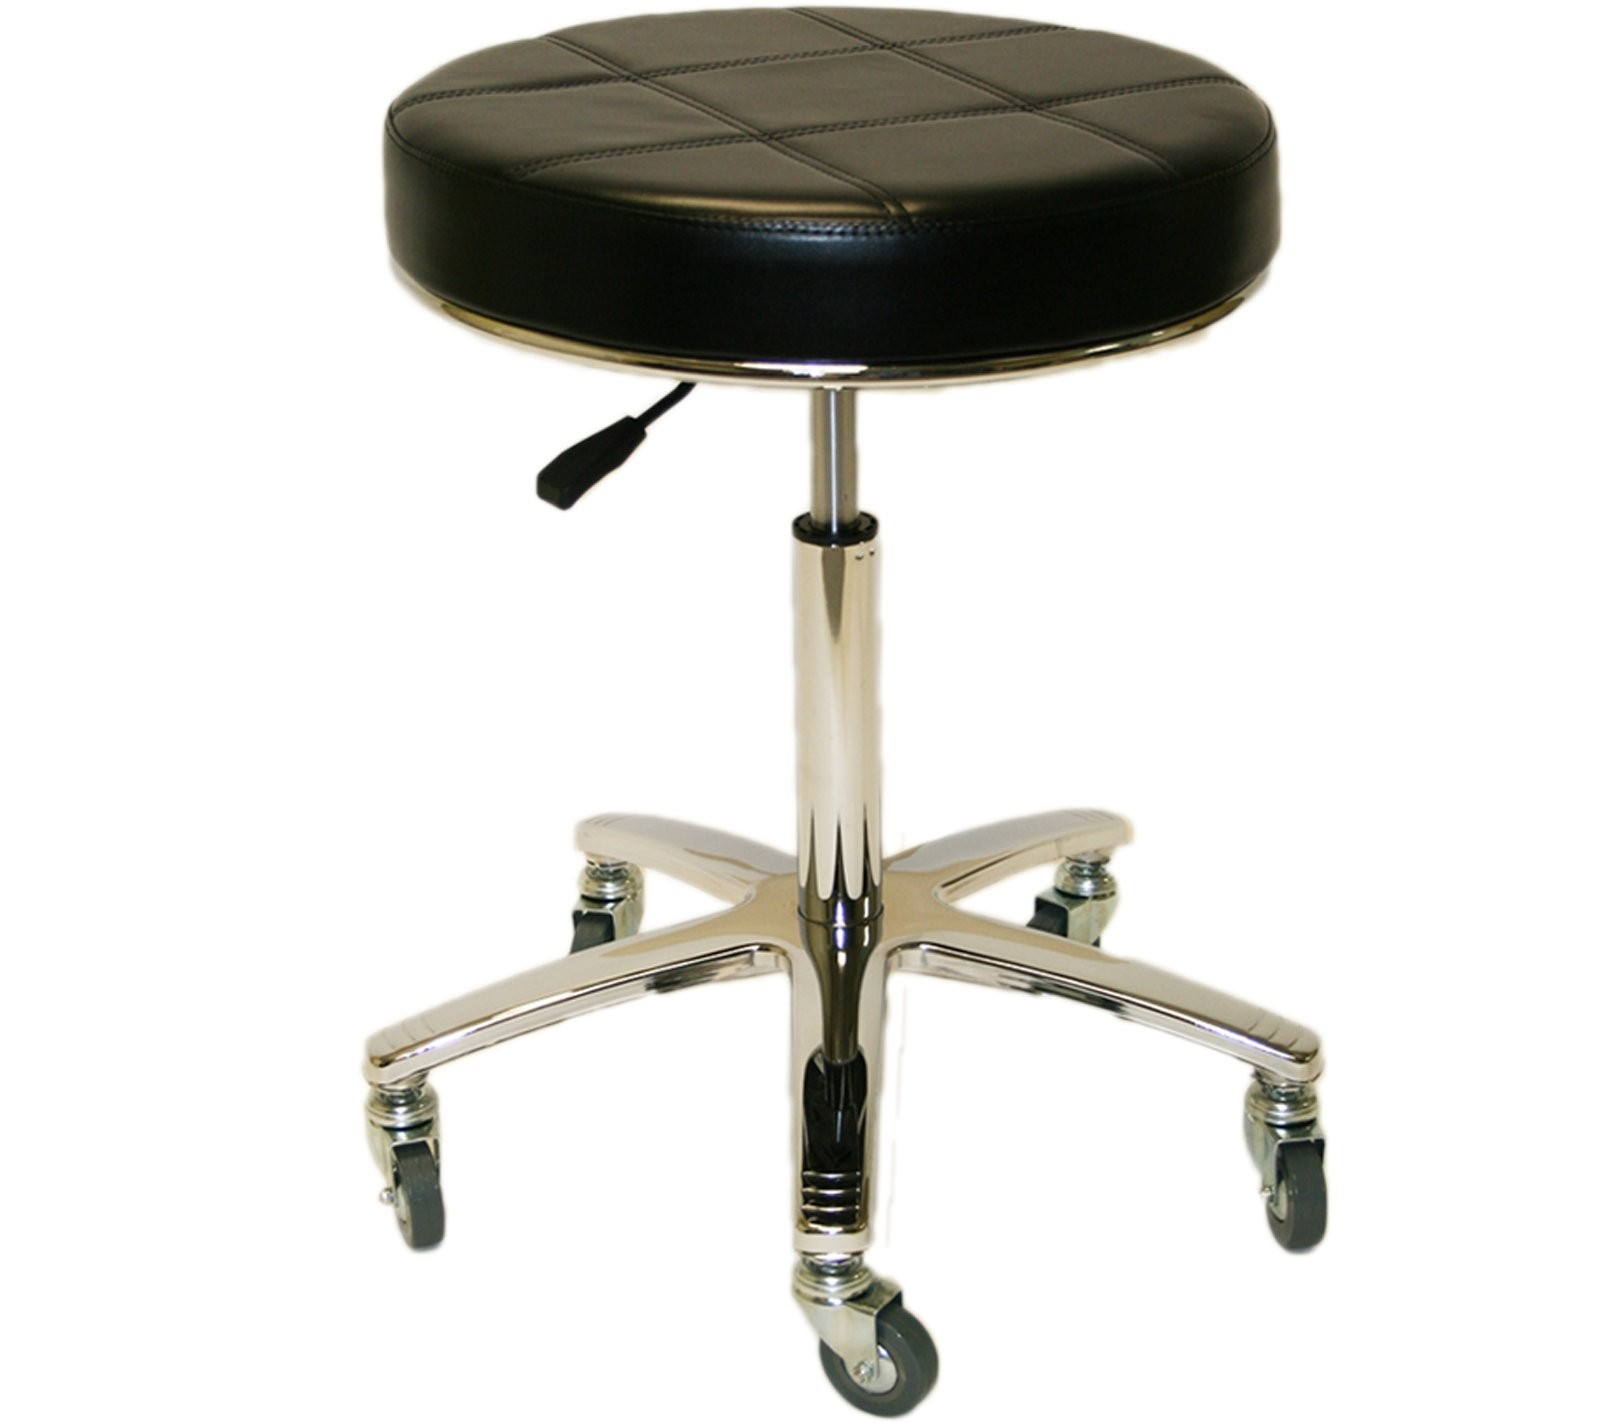 Breakfast Bar Padded Top Seat Folding Stool Portable Space Saving Non Slip Feet